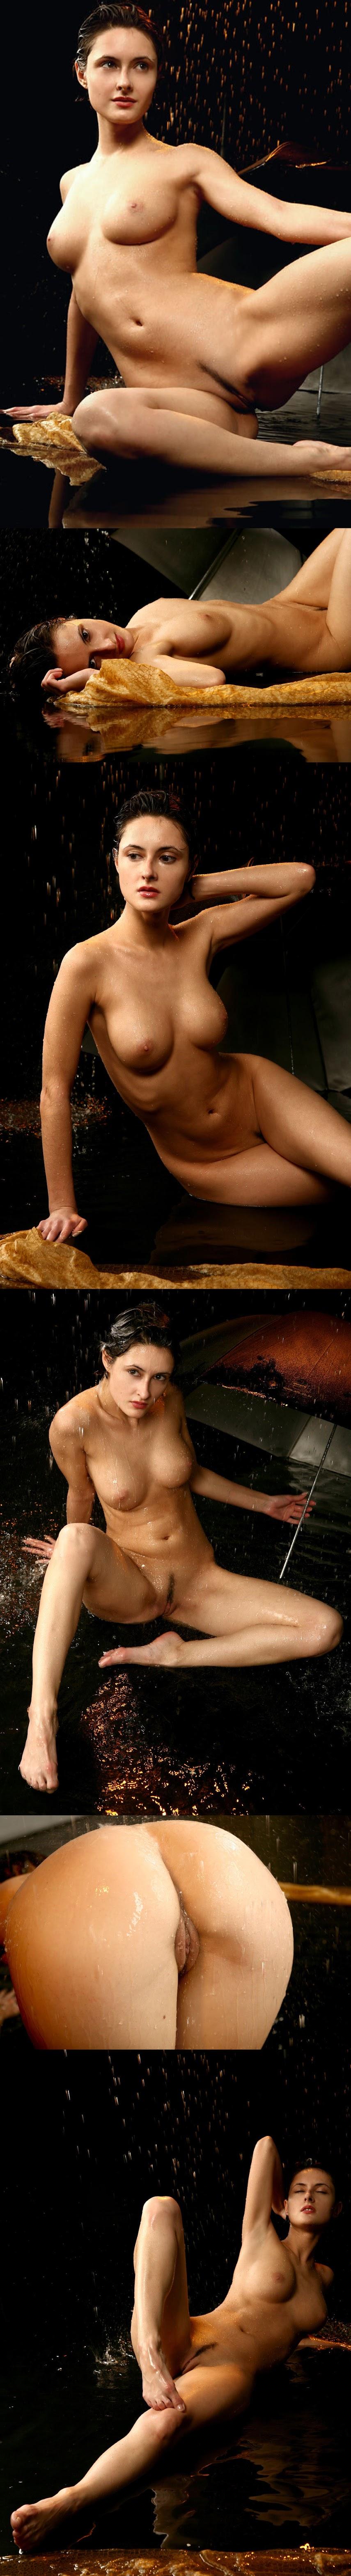 MA_20080417_-_Leona_B_-_Presenting_-_by_Rylsky.zip-jk- Met-Art MA 20080418 - Elle A - Presenting - by Nicolas Grier